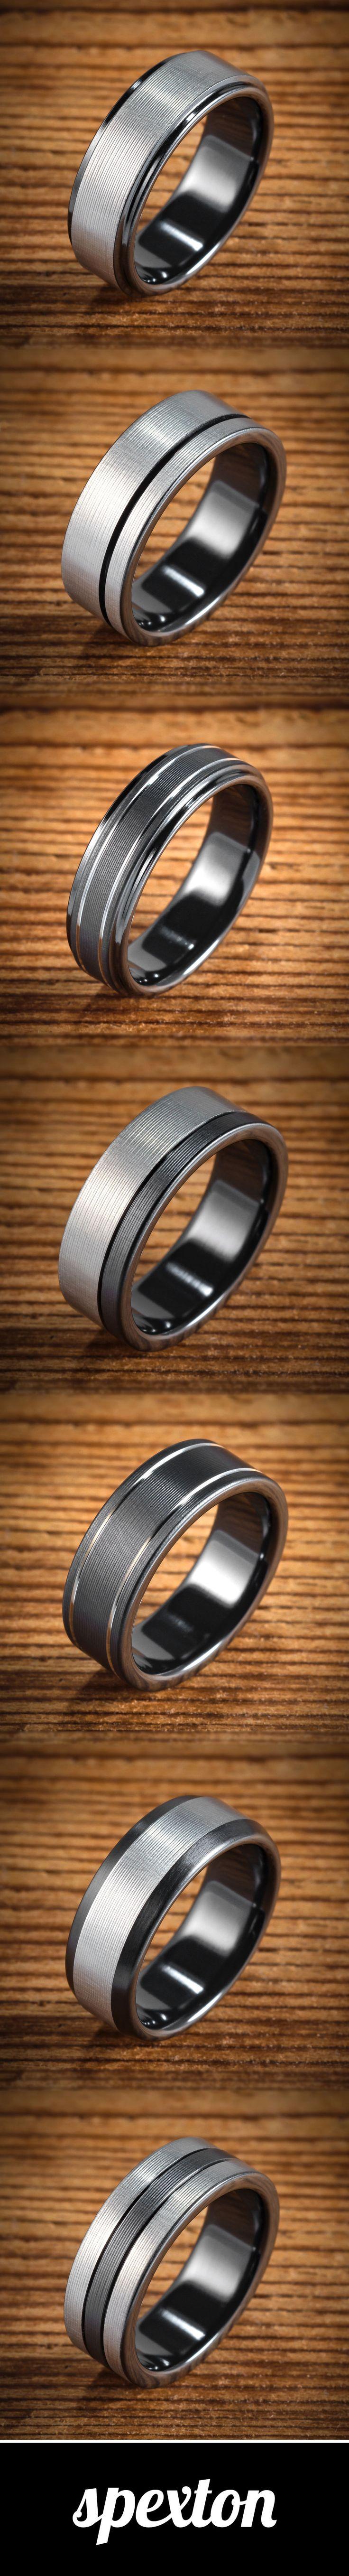 Black & Silver Bi-Color Black Zirconium Men's Wedding Bands custom made by Spexton